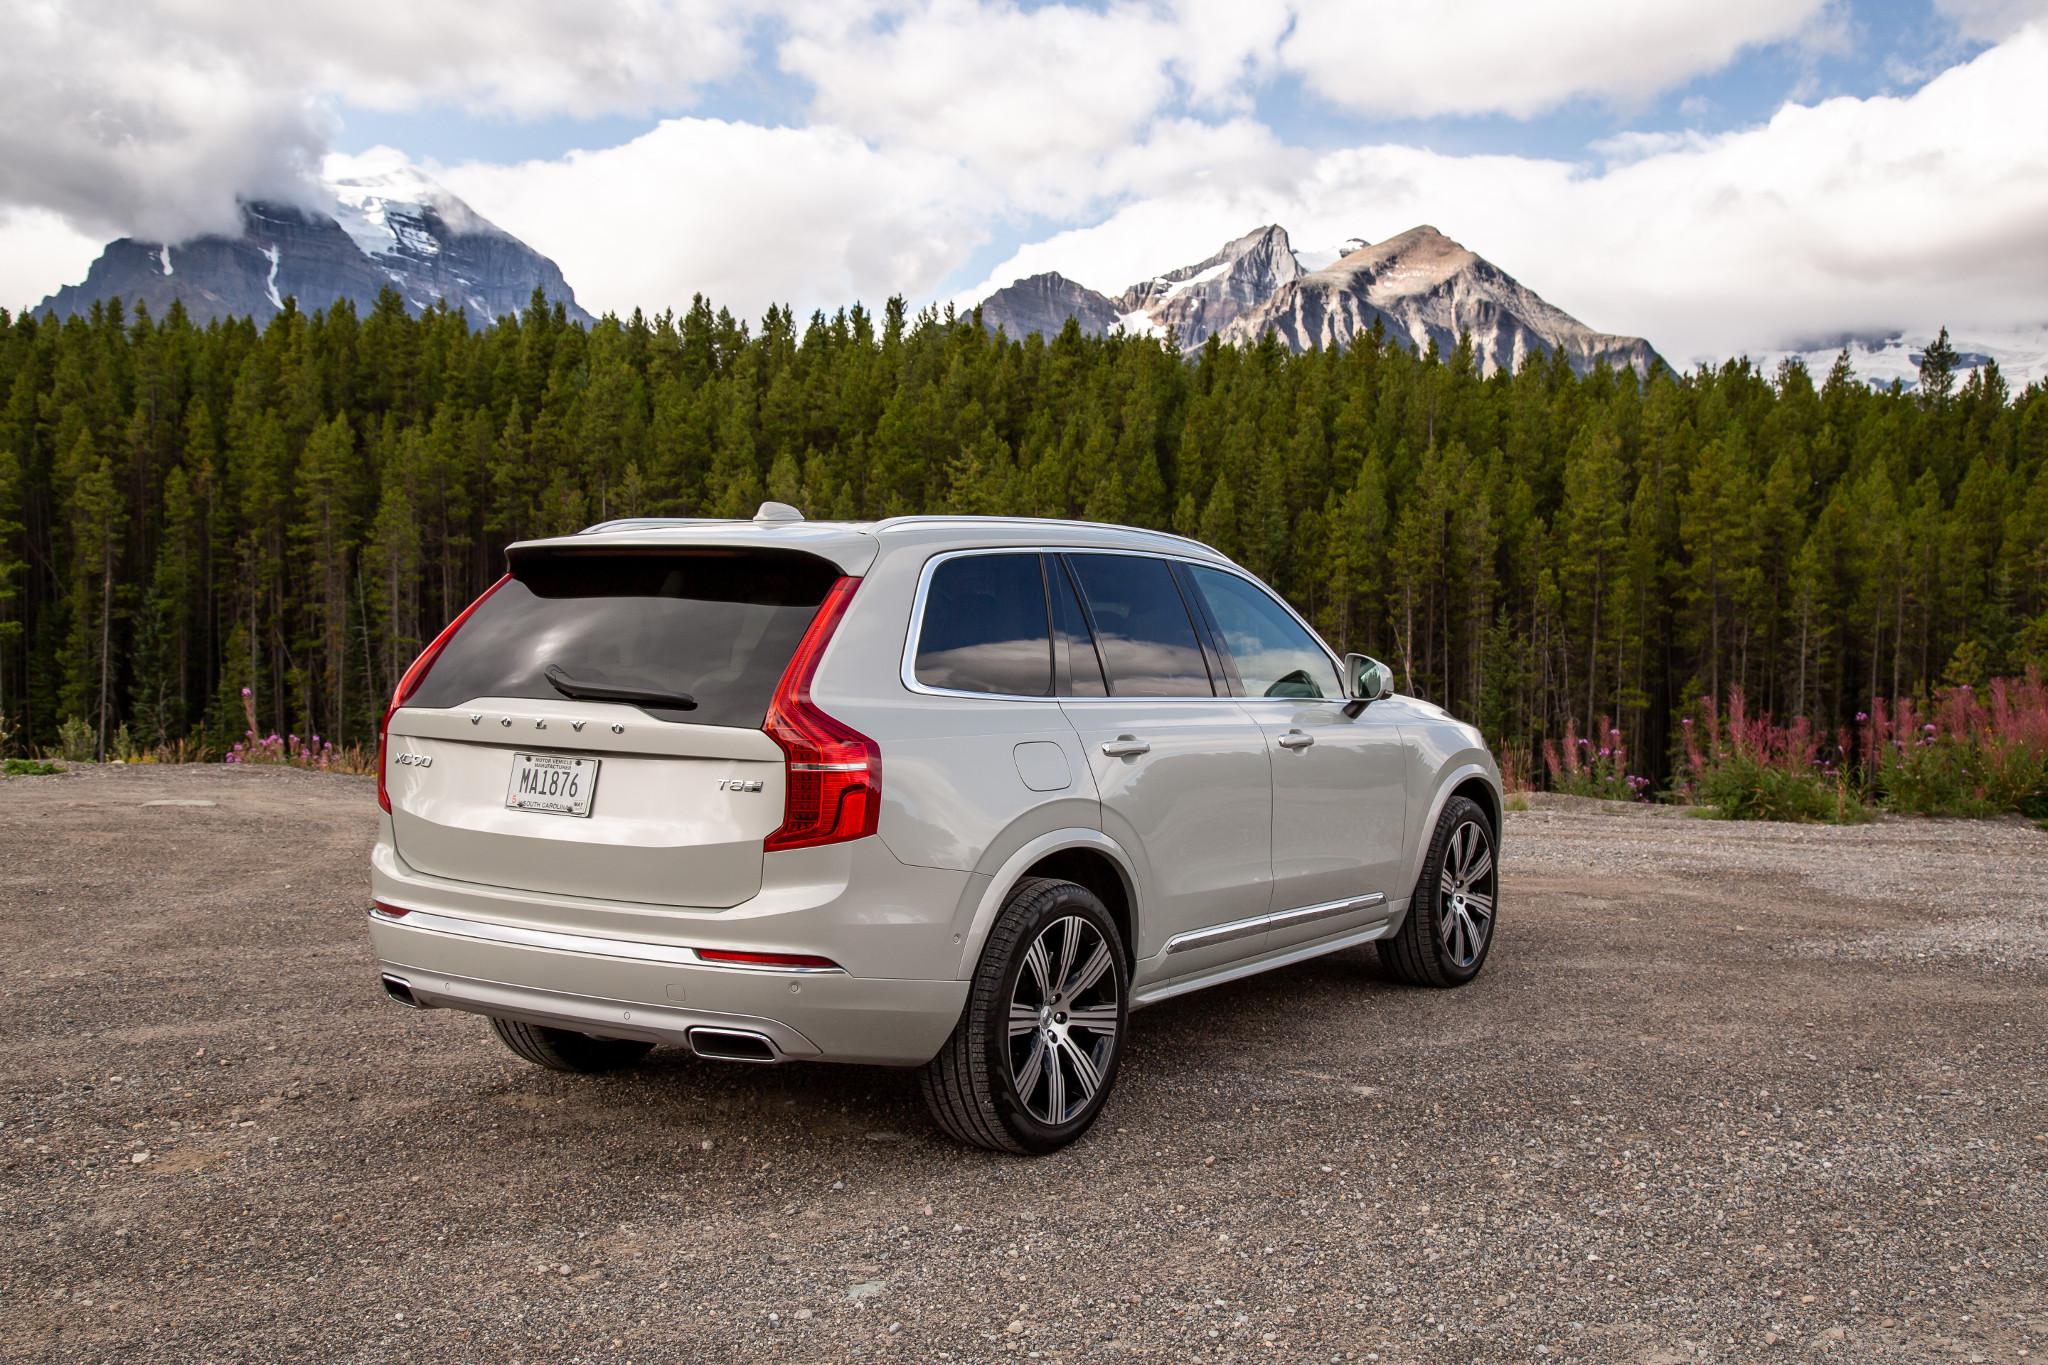 volvo-xc90-t8-inscription-2020-05-angle--exterior--mountains--rear--trees--white.jpg